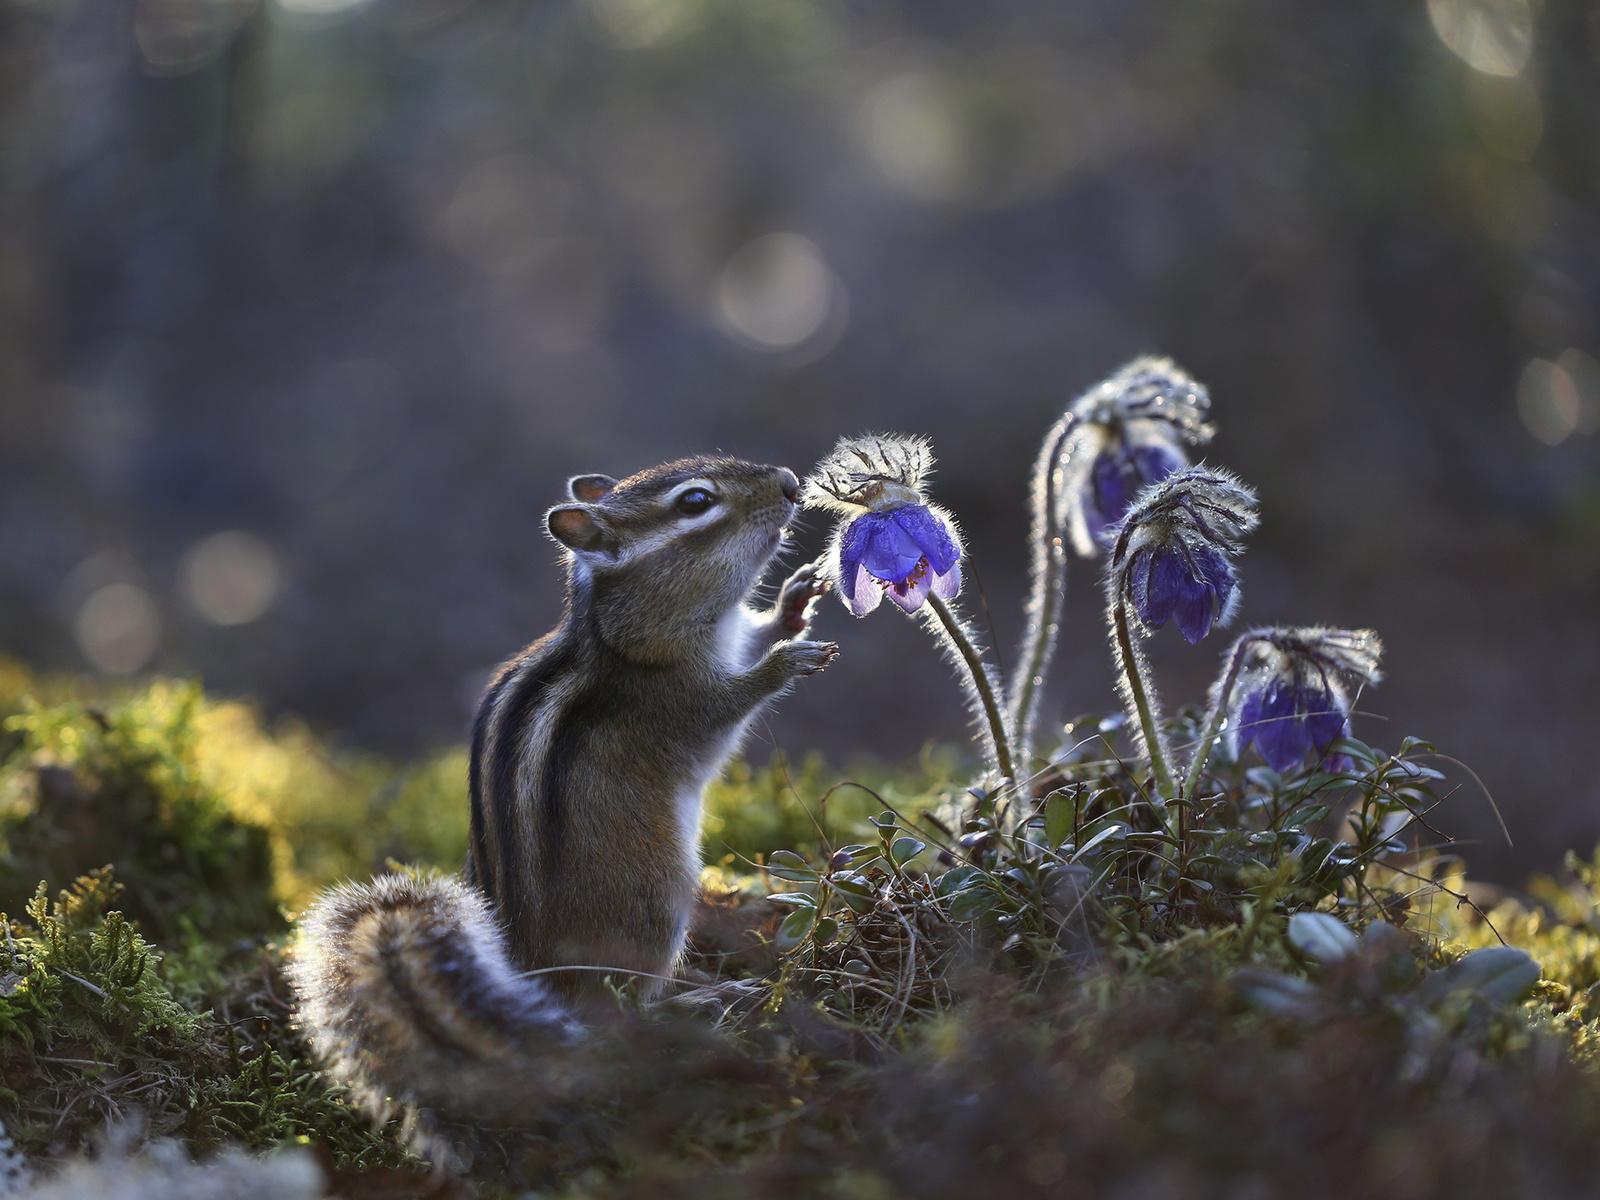 природа, весна, первоцветы, прострел, зверёк, бурундук, грызун, сон-трава, боке